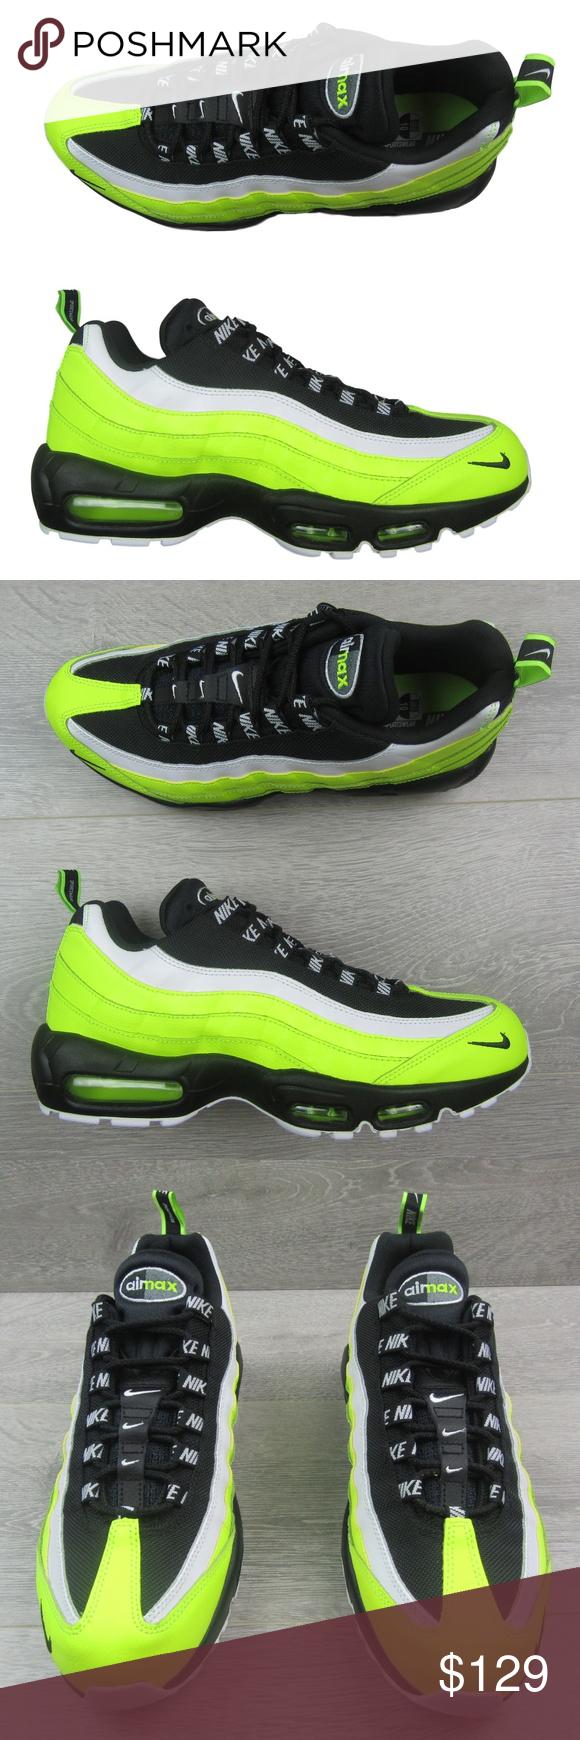 Nike Air Max 95 Premium Volt Glow Where To Buy 538416